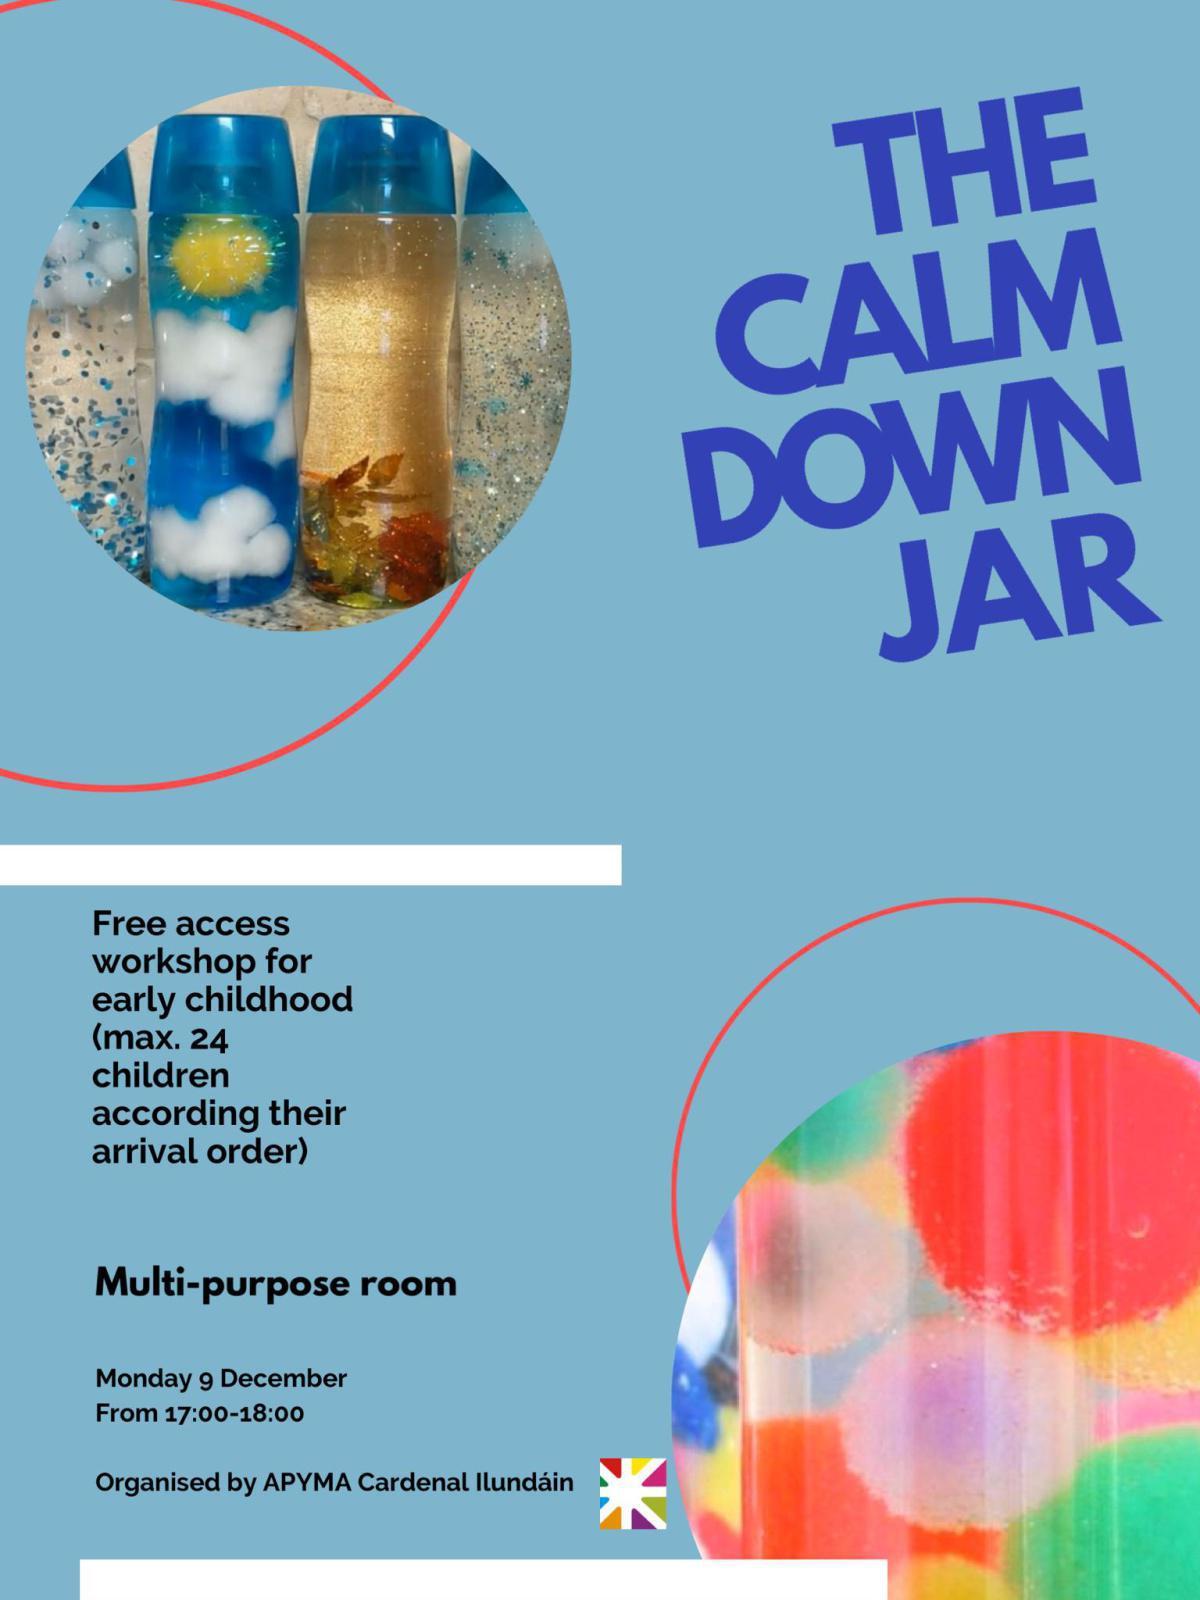 Calming jar workshop